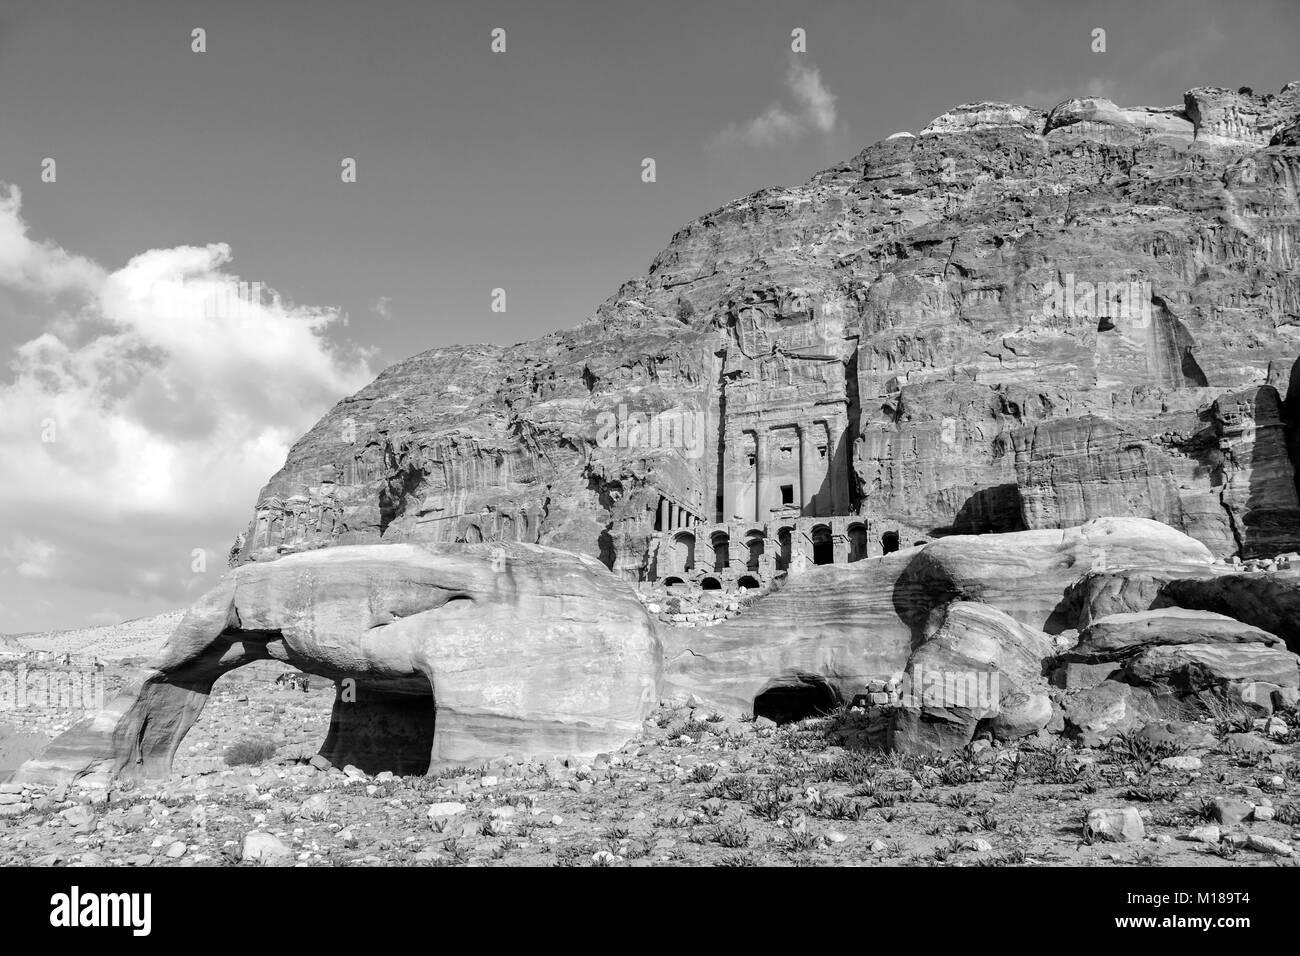 huge discount bfdd1 c0f34 Urn Tomb, Silk Tomb and Royal tombs, Petra, Jordan (monochrome) -